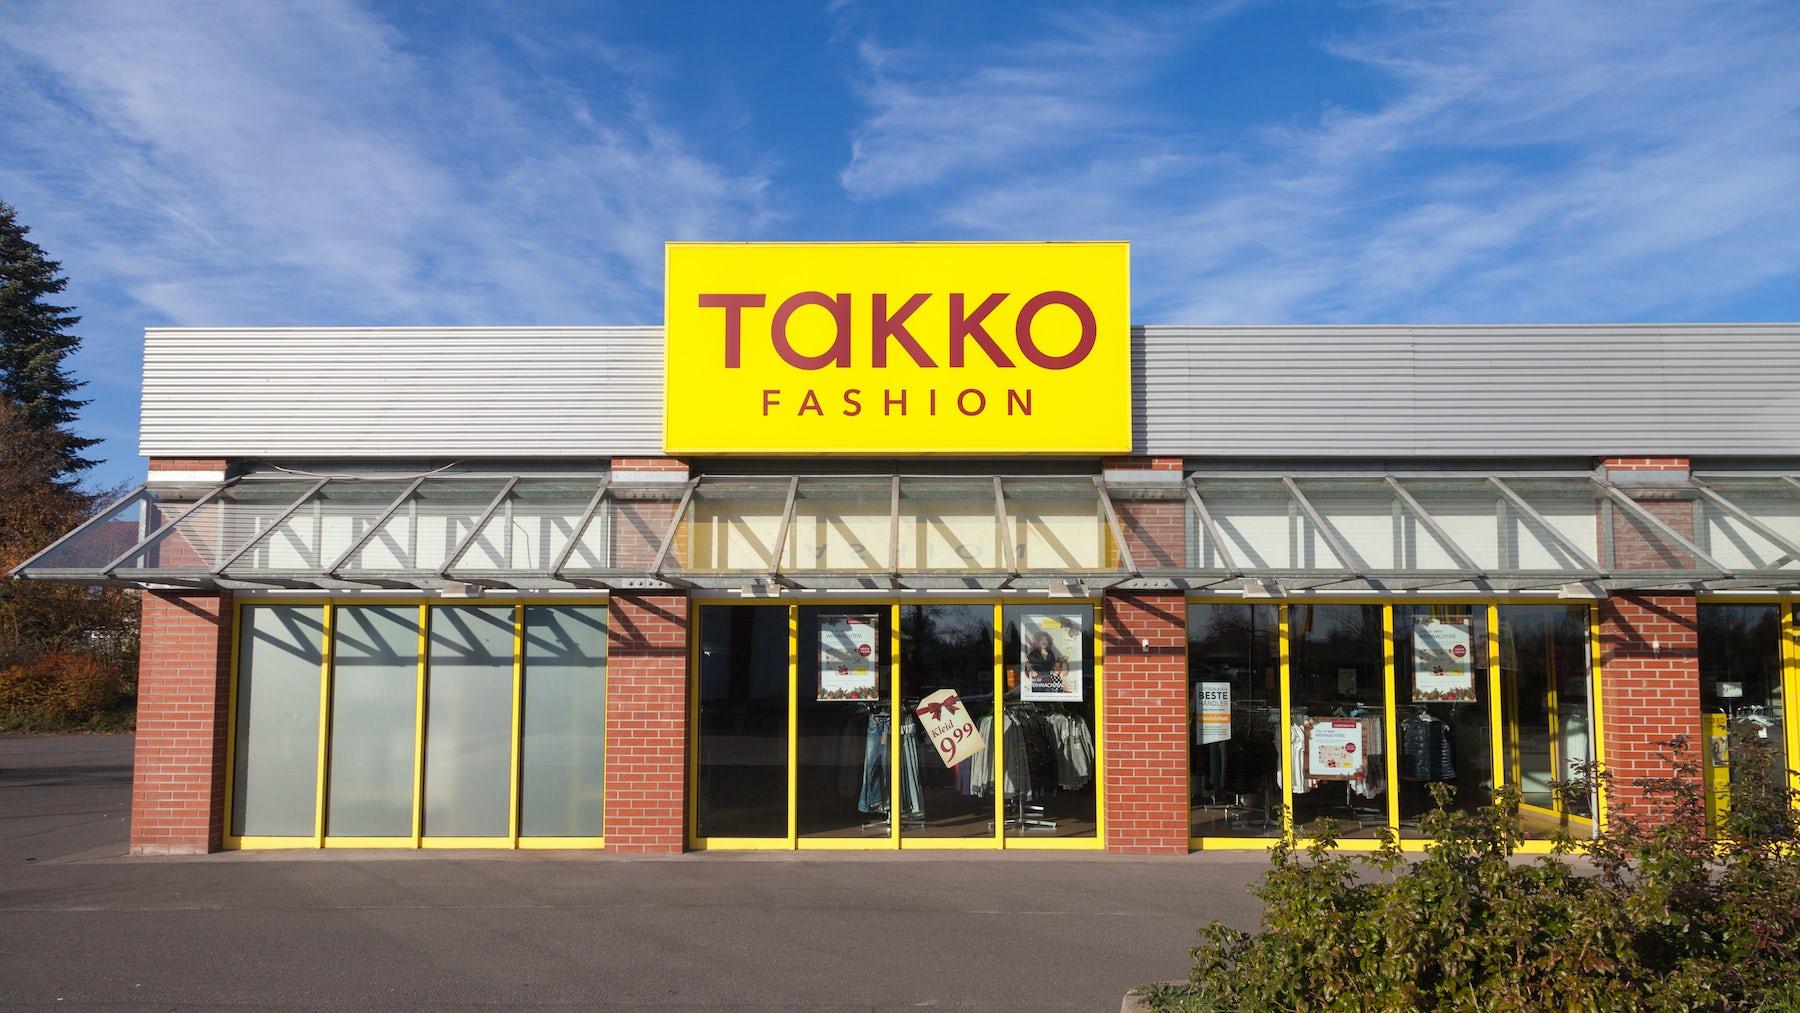 A Takko store | Source: Shutterstock